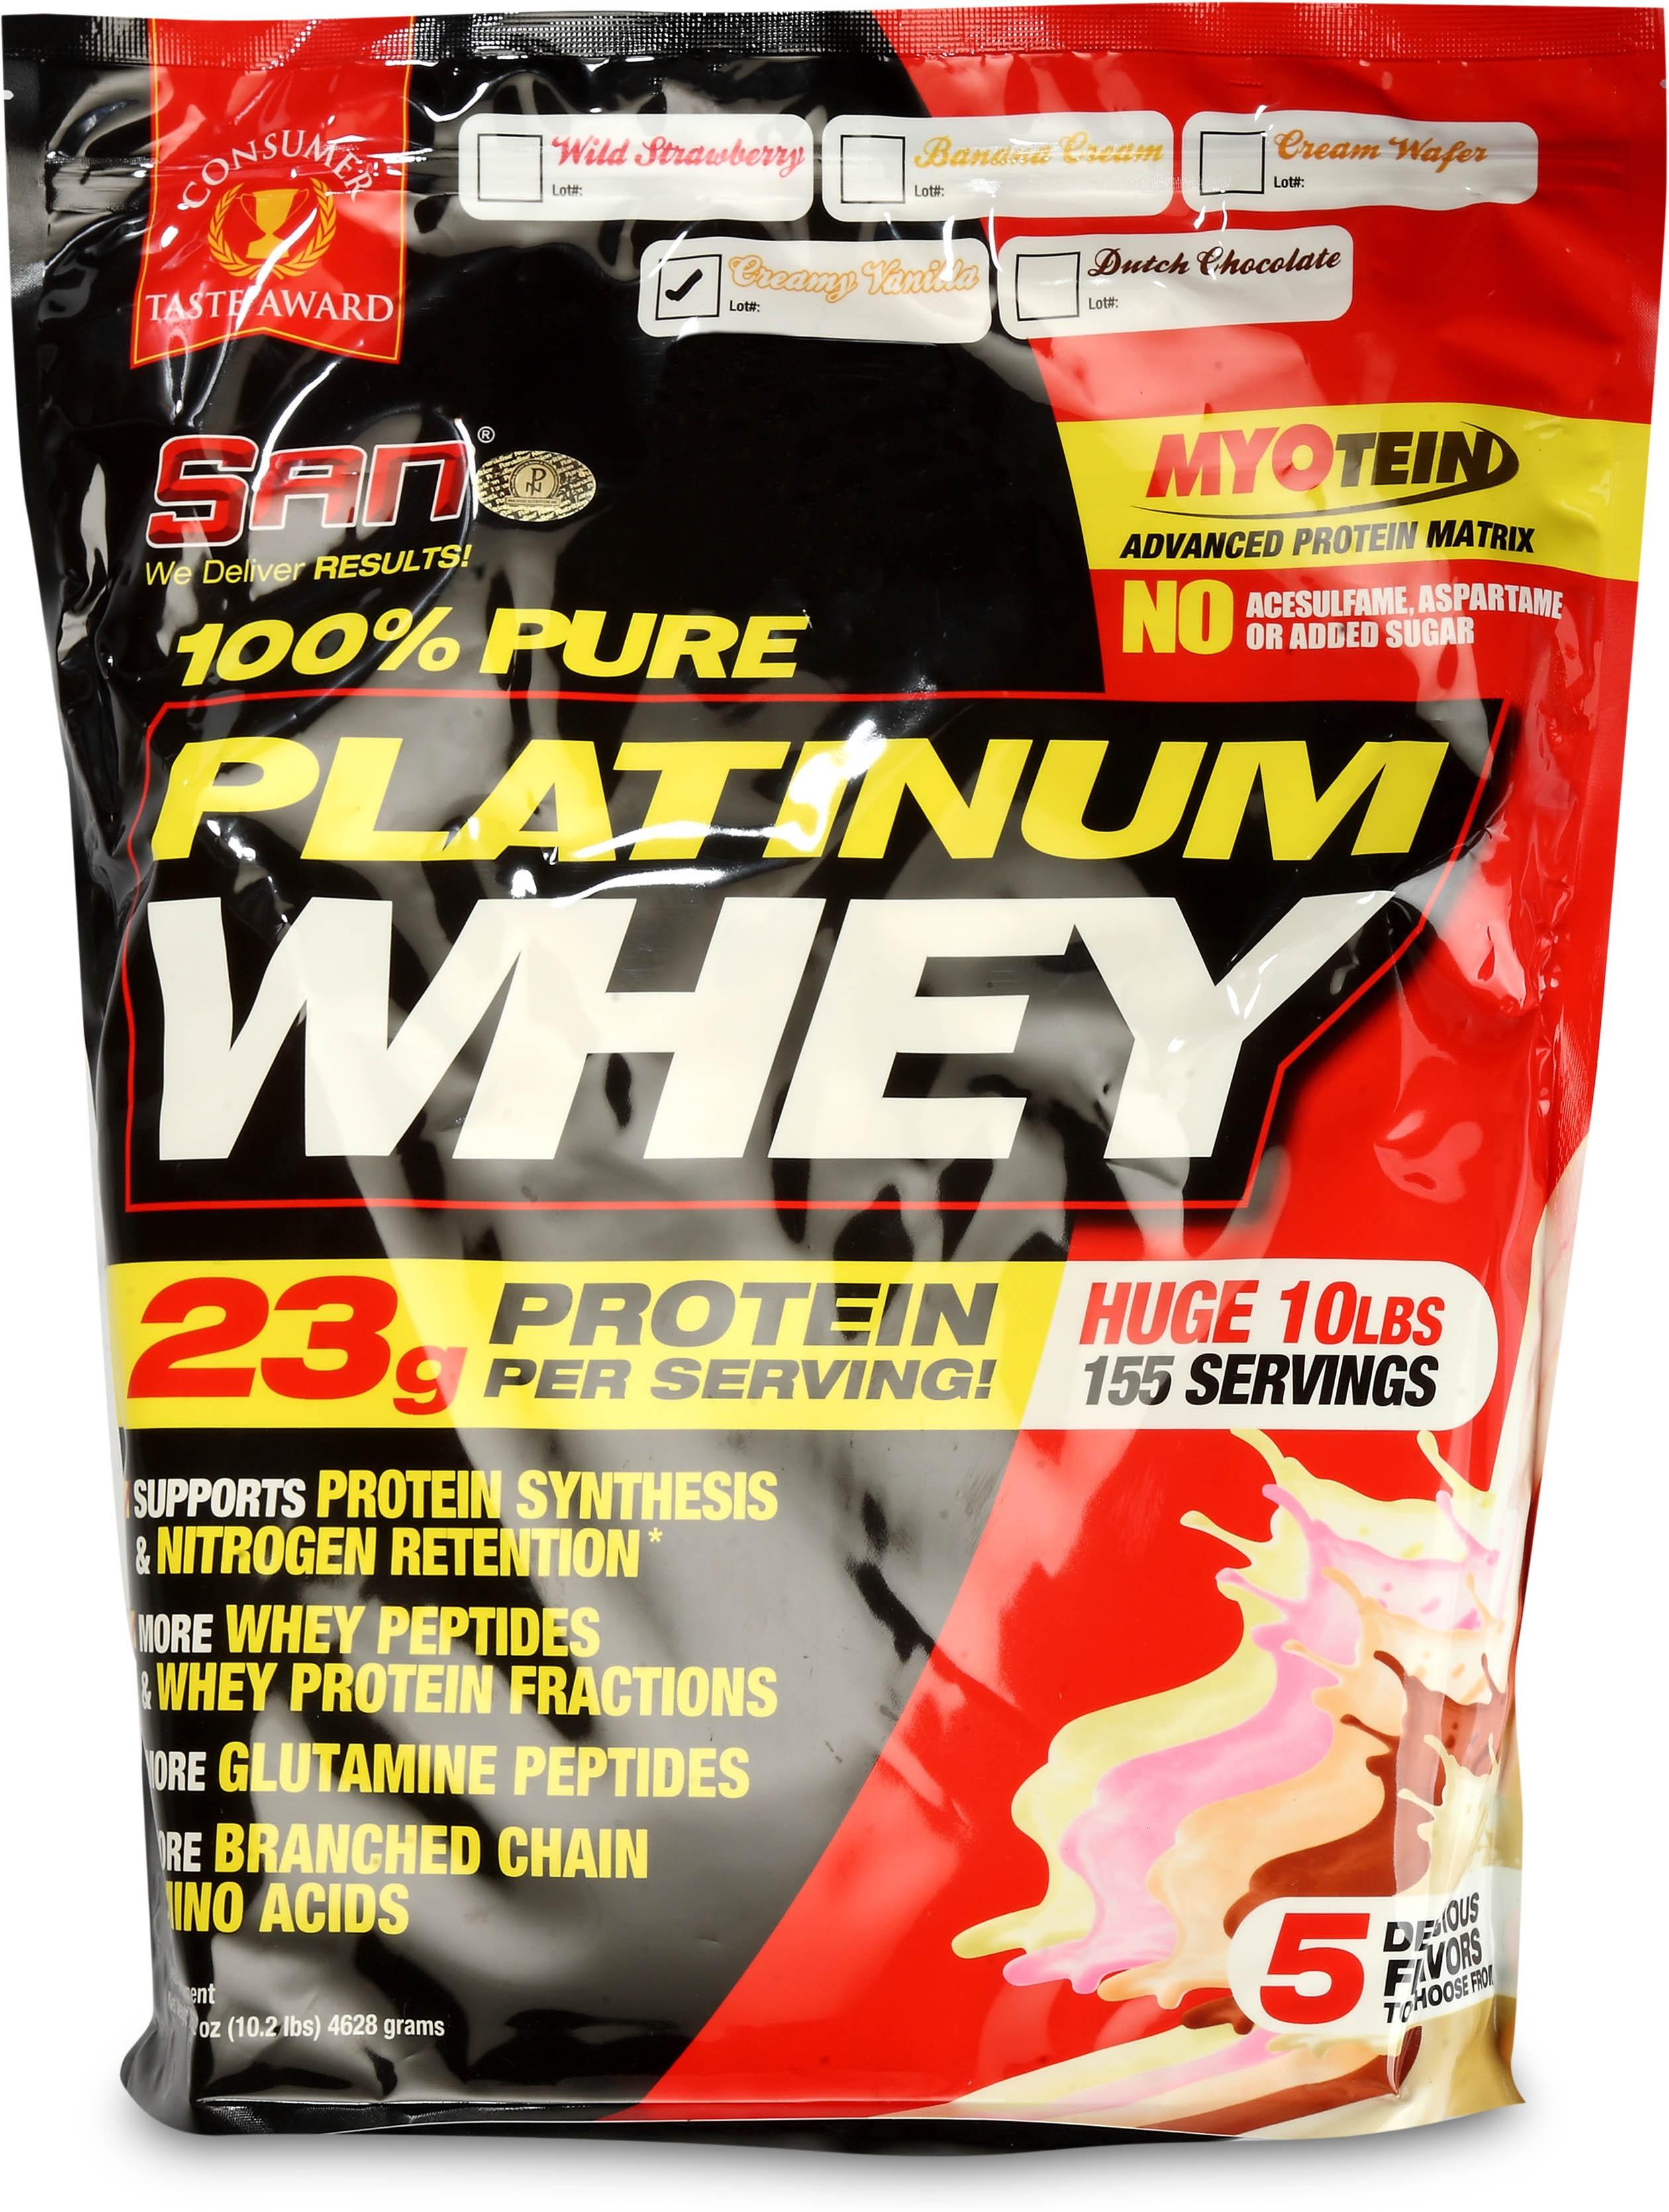 SAN 100 Pure Platinum Whey 10lbs Whey Protein4628 g Creamy Vanilla